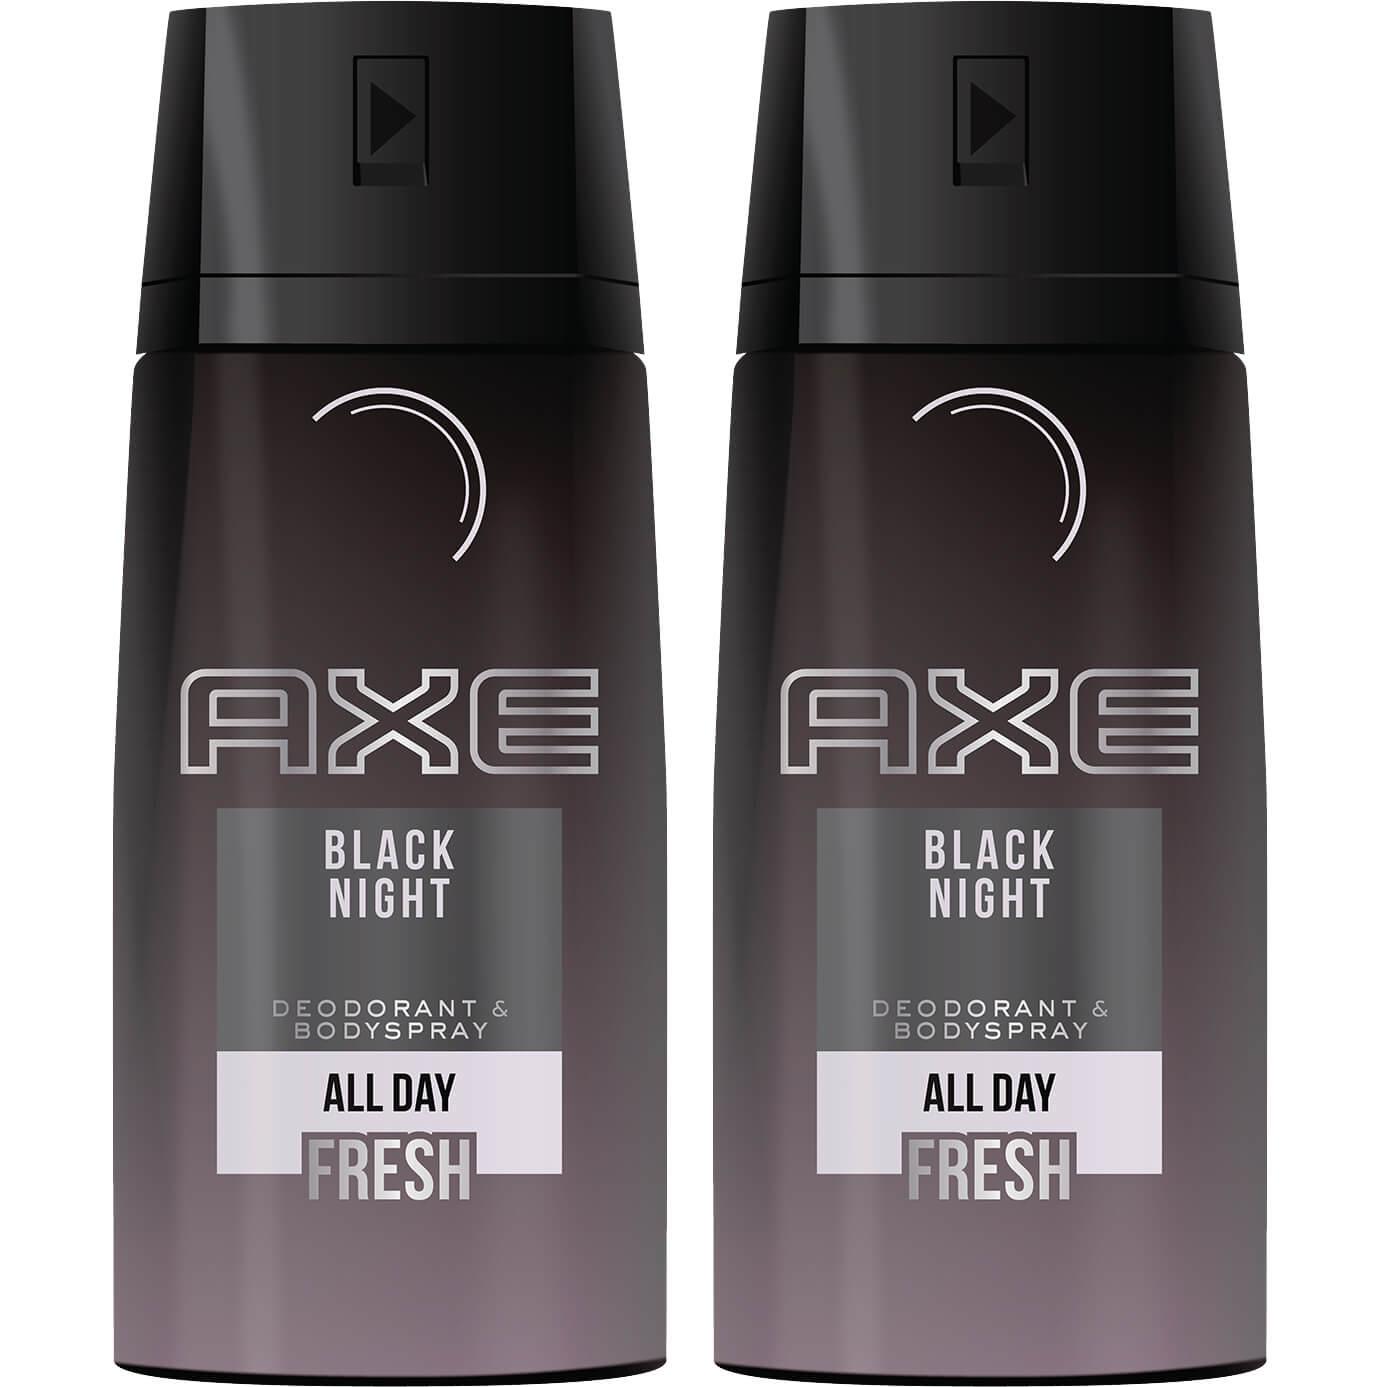 Axe Πακέτο Προσφοράς Black Night Spray Αποσμητικό μεΛεπτόκαι Μυστηριώδες Άρωμα 2x150ml 1+1 Δώρο